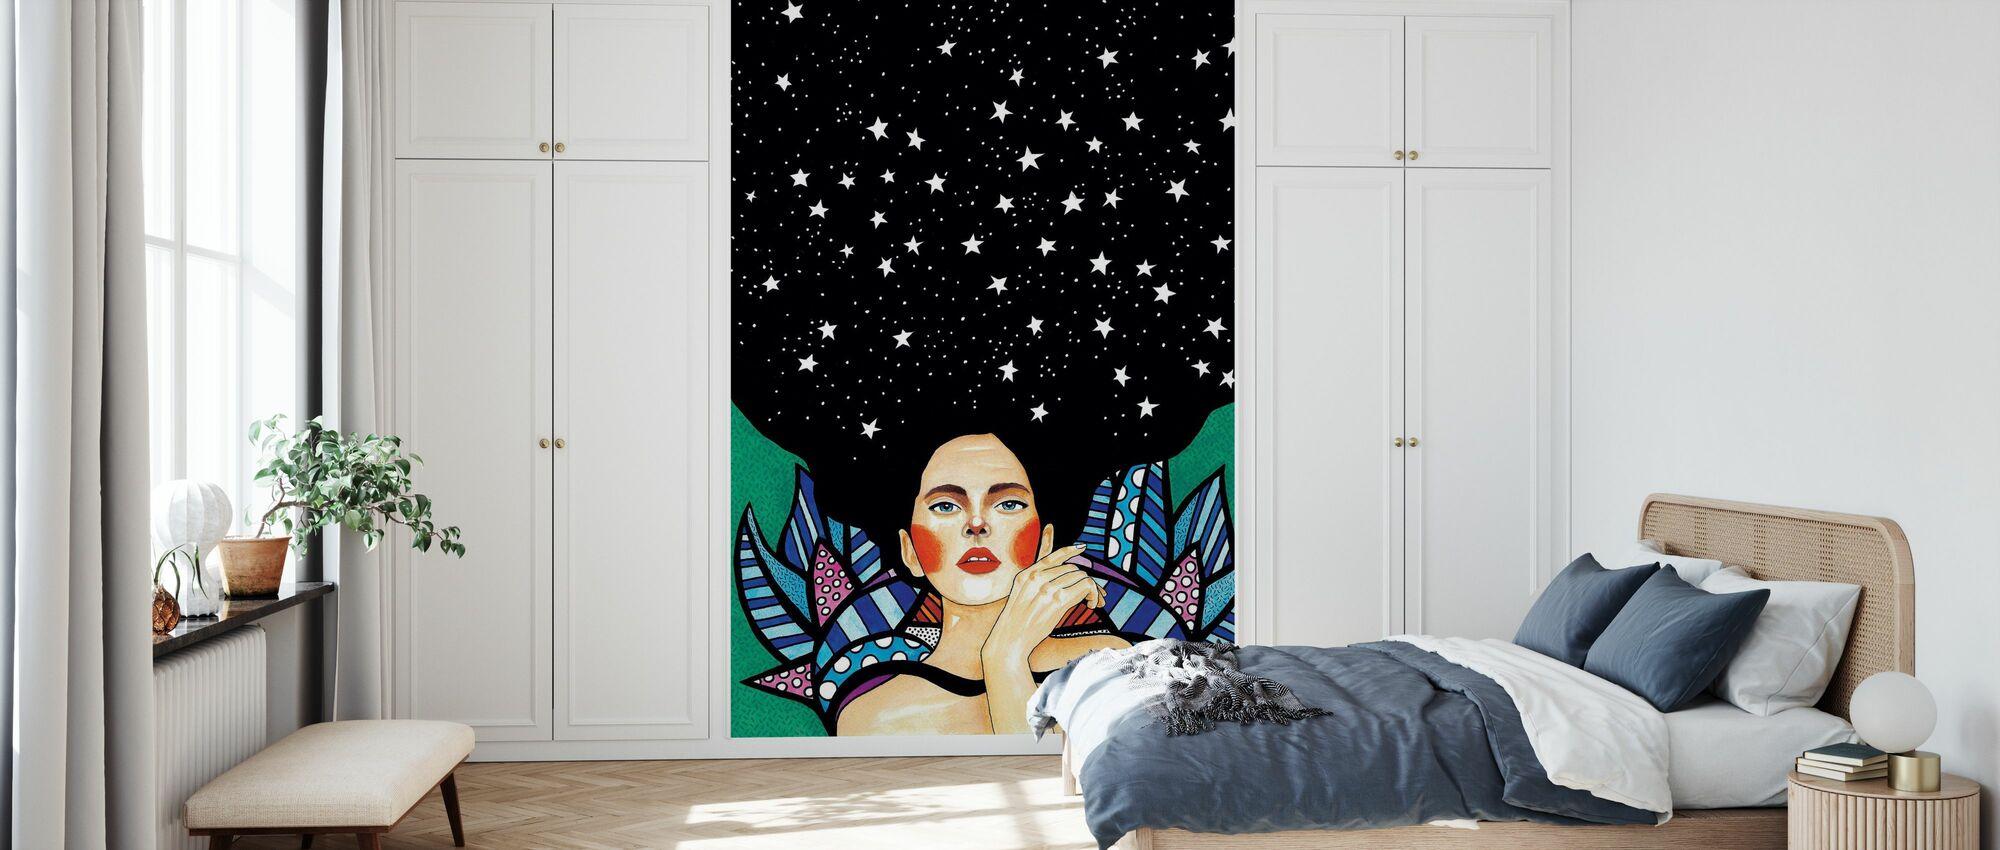 Like theres No Tomorrow - Wallpaper - Bedroom